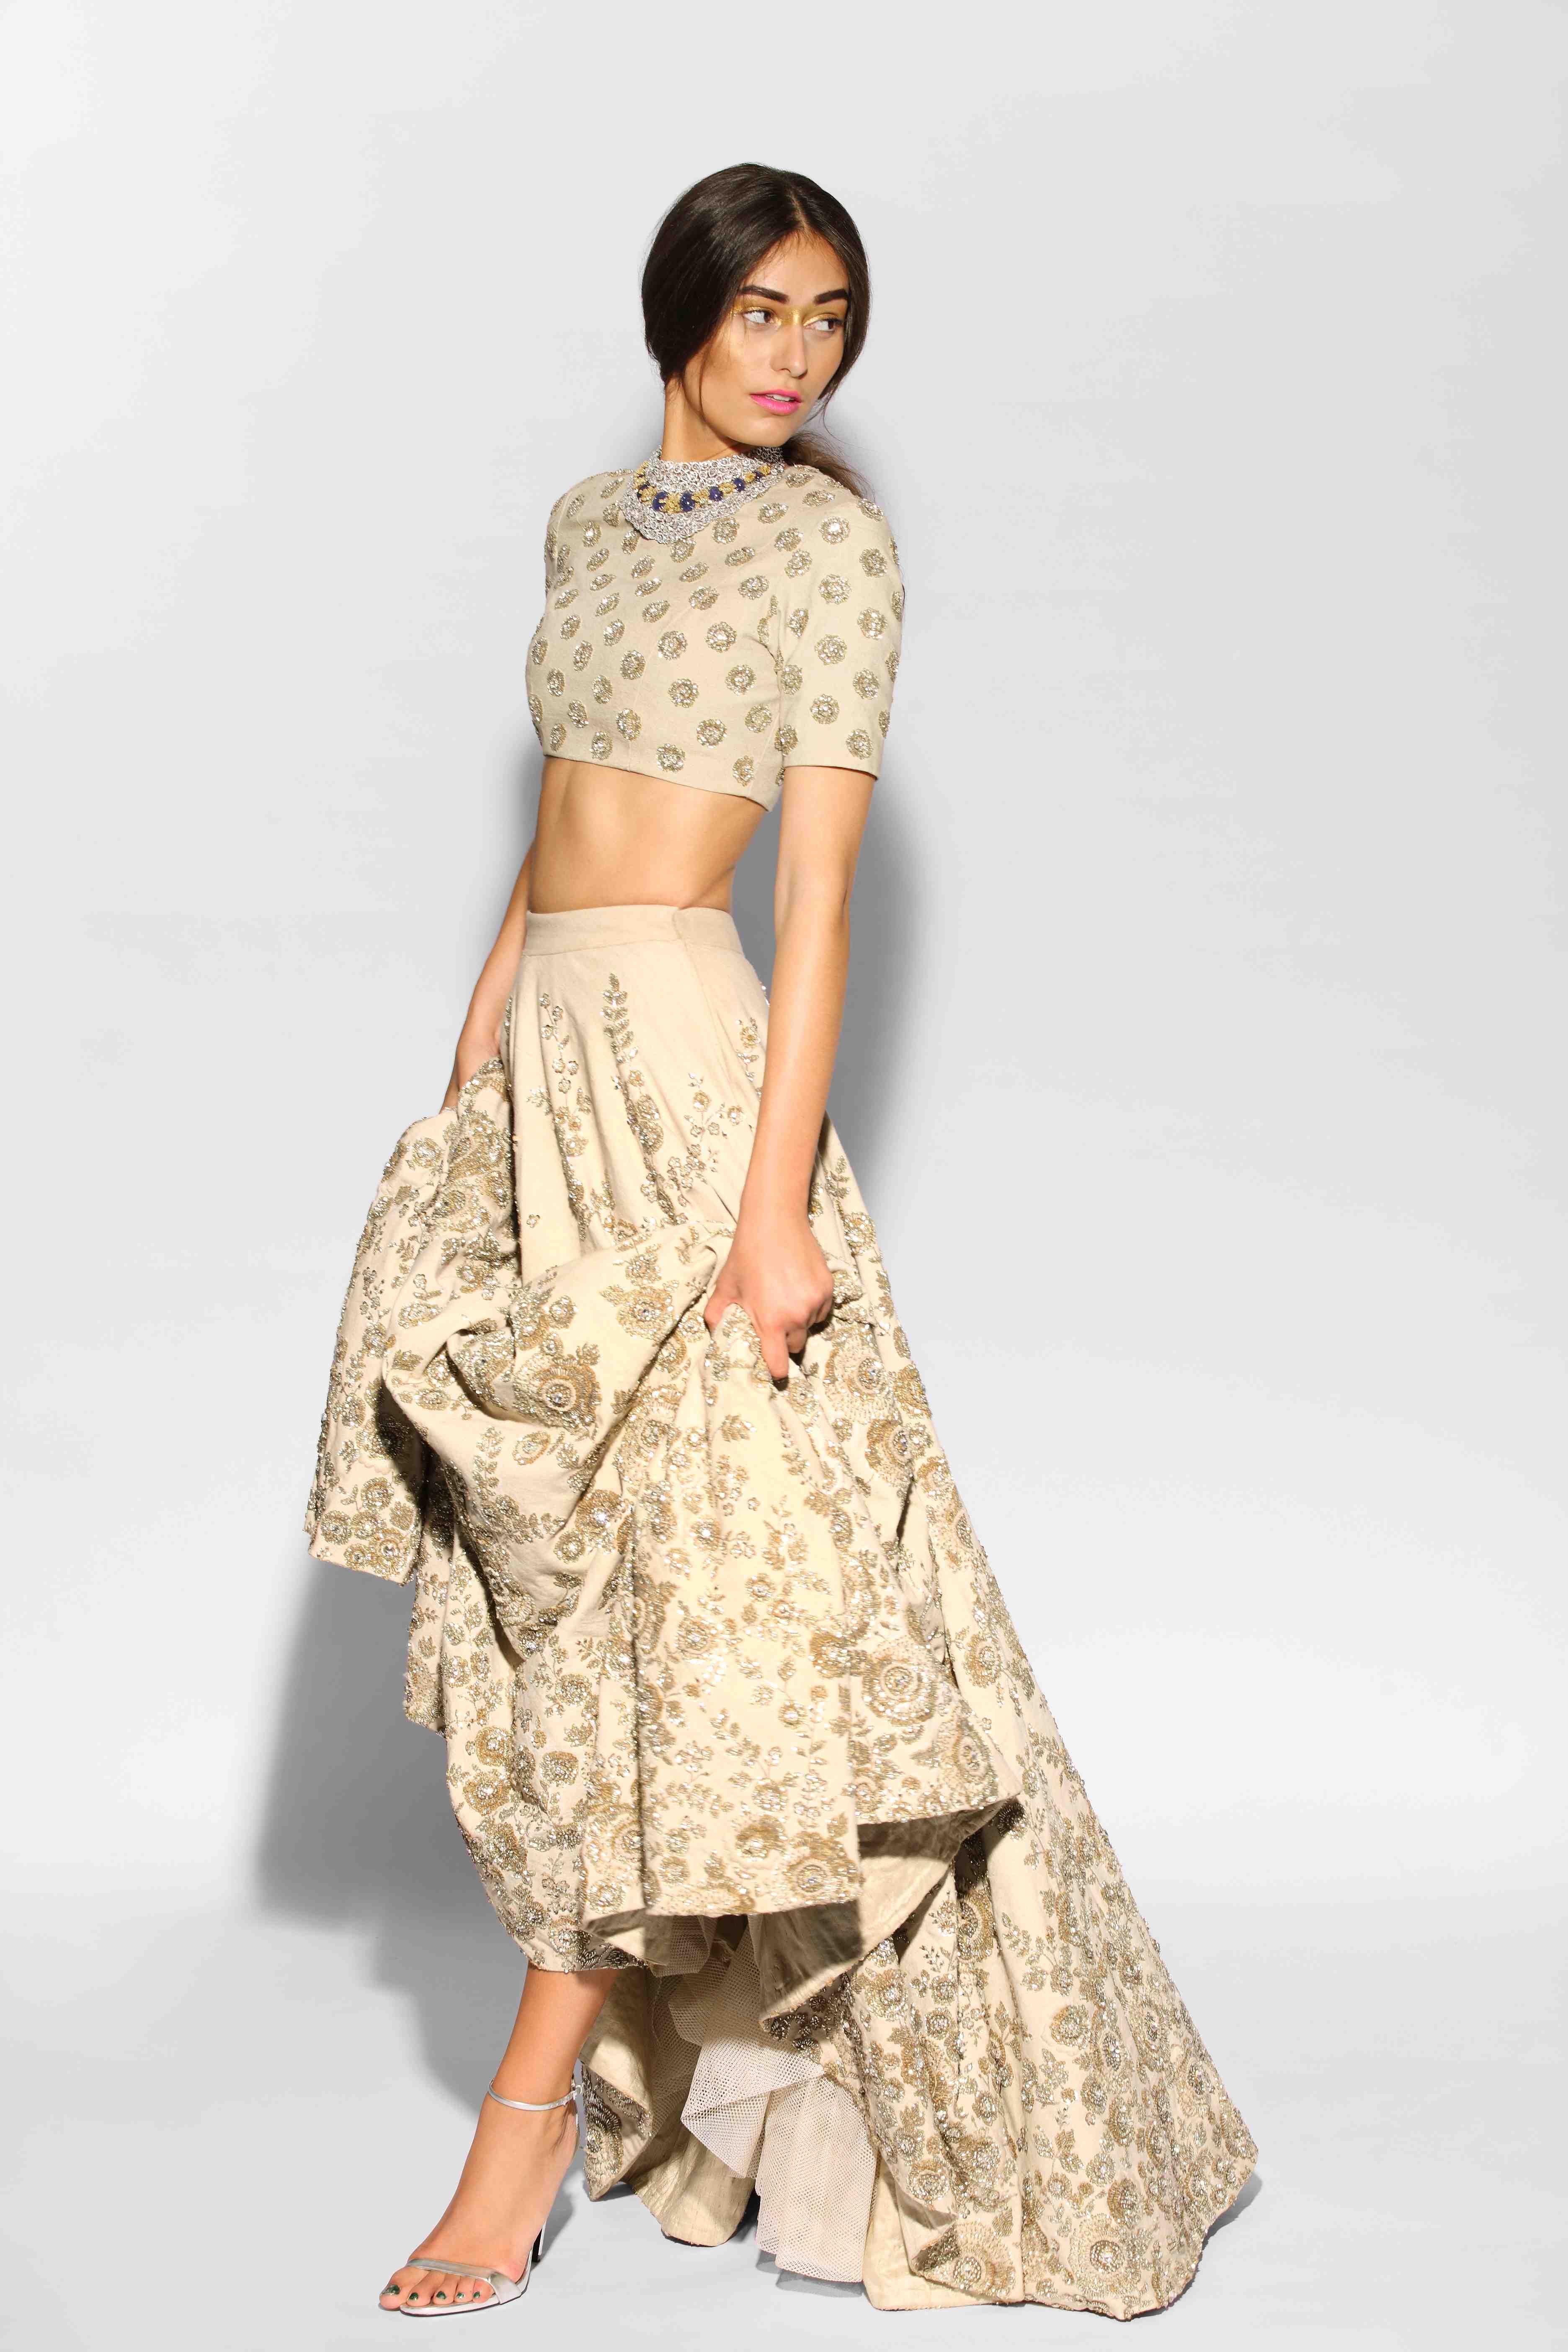 Aashni Co Wedding Show Asian Fashion Blog Goals Indian Outfits Modern: Modern Asian Wedding Dresses At Reisefeber.org